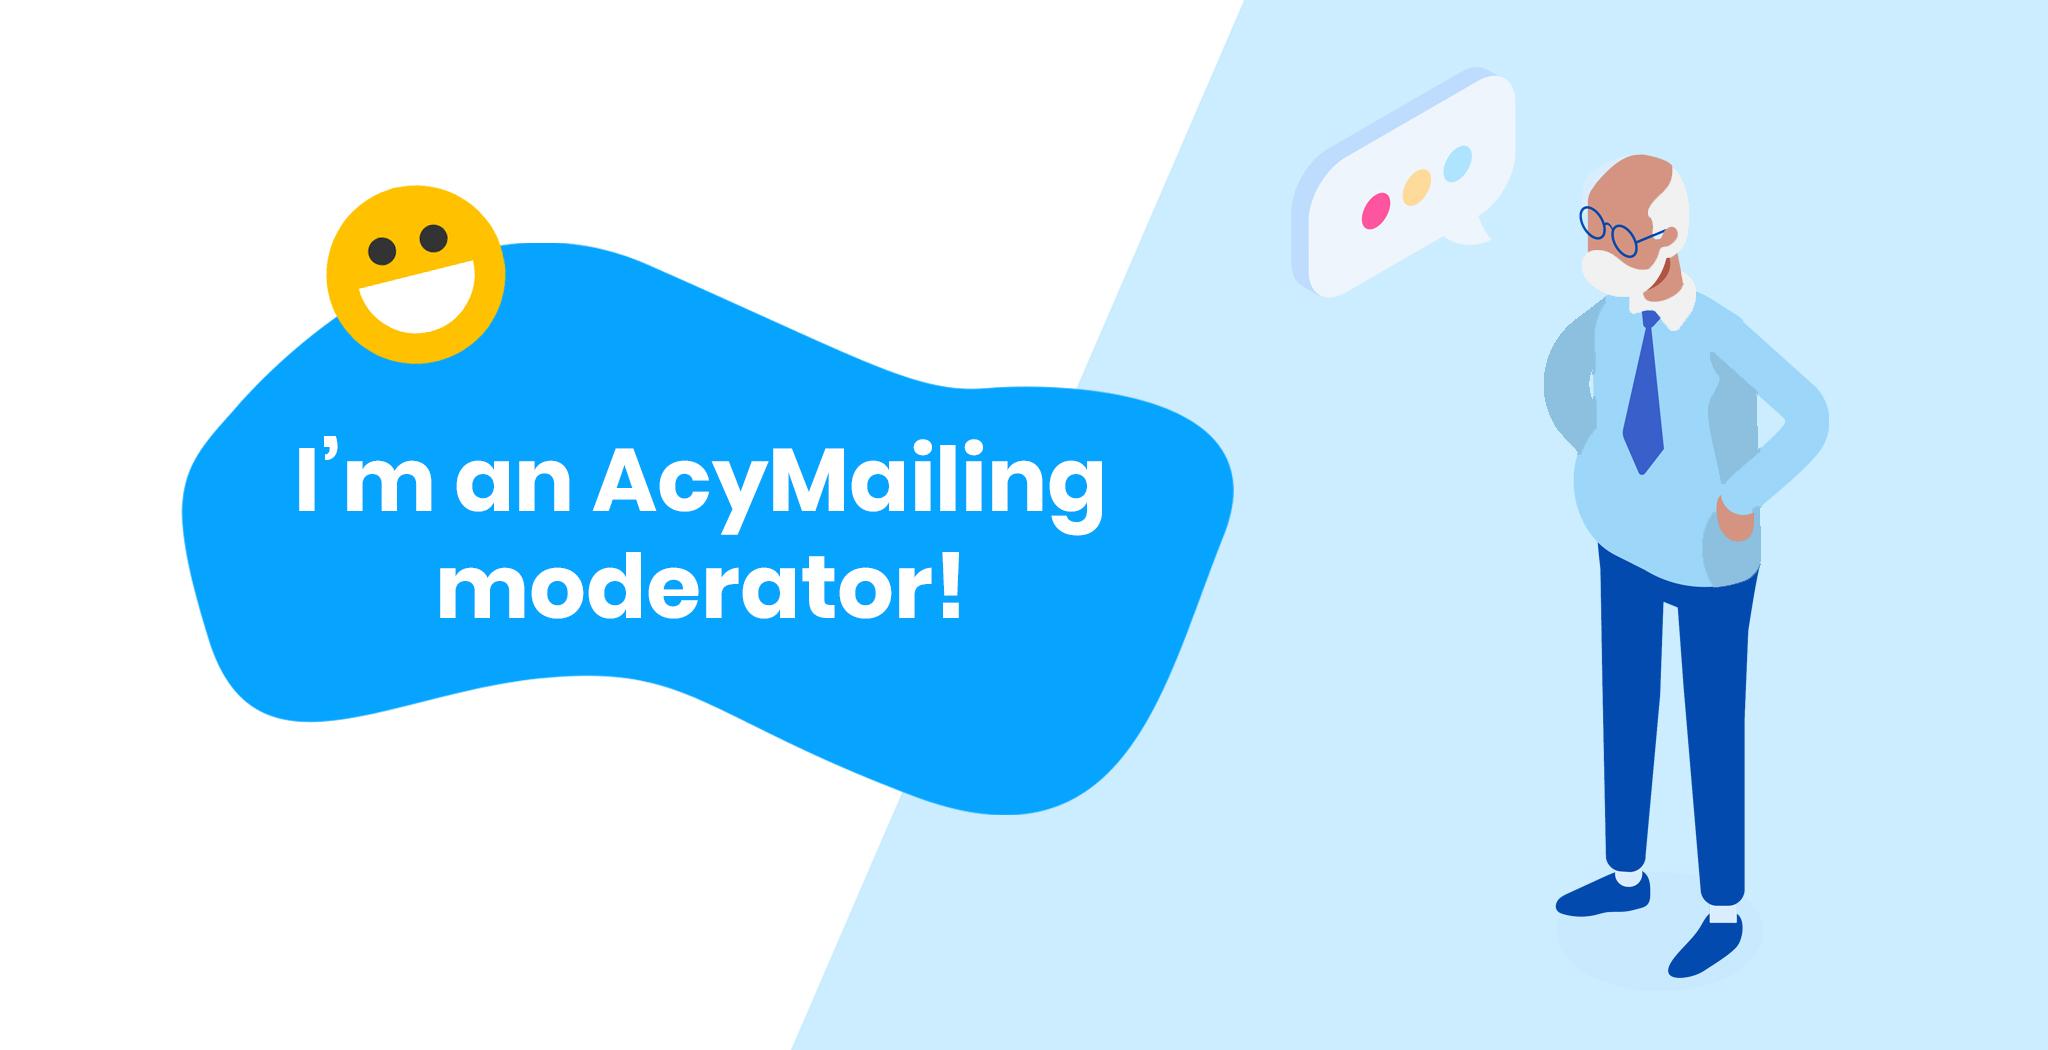 AcyMailing Forum moderator